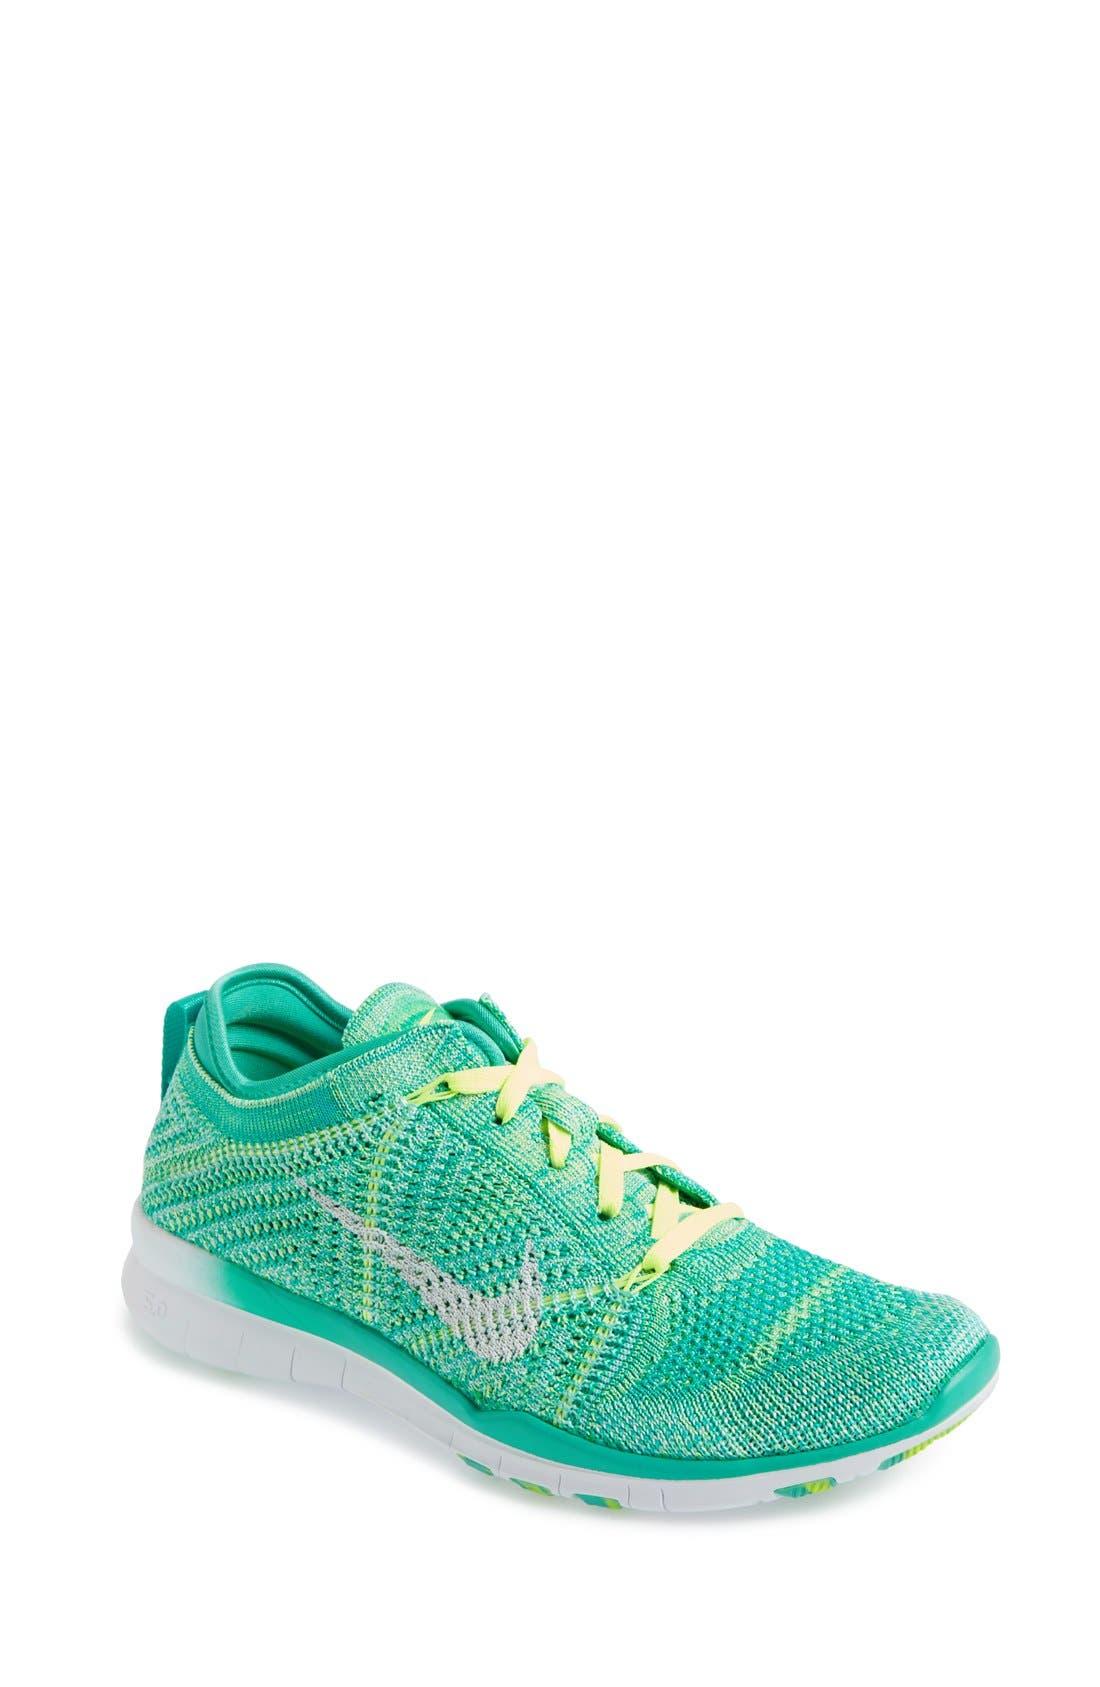 ,                             'Free Flyknit 5.0 TR' Training Shoe,                             Main thumbnail 20, color,                             303